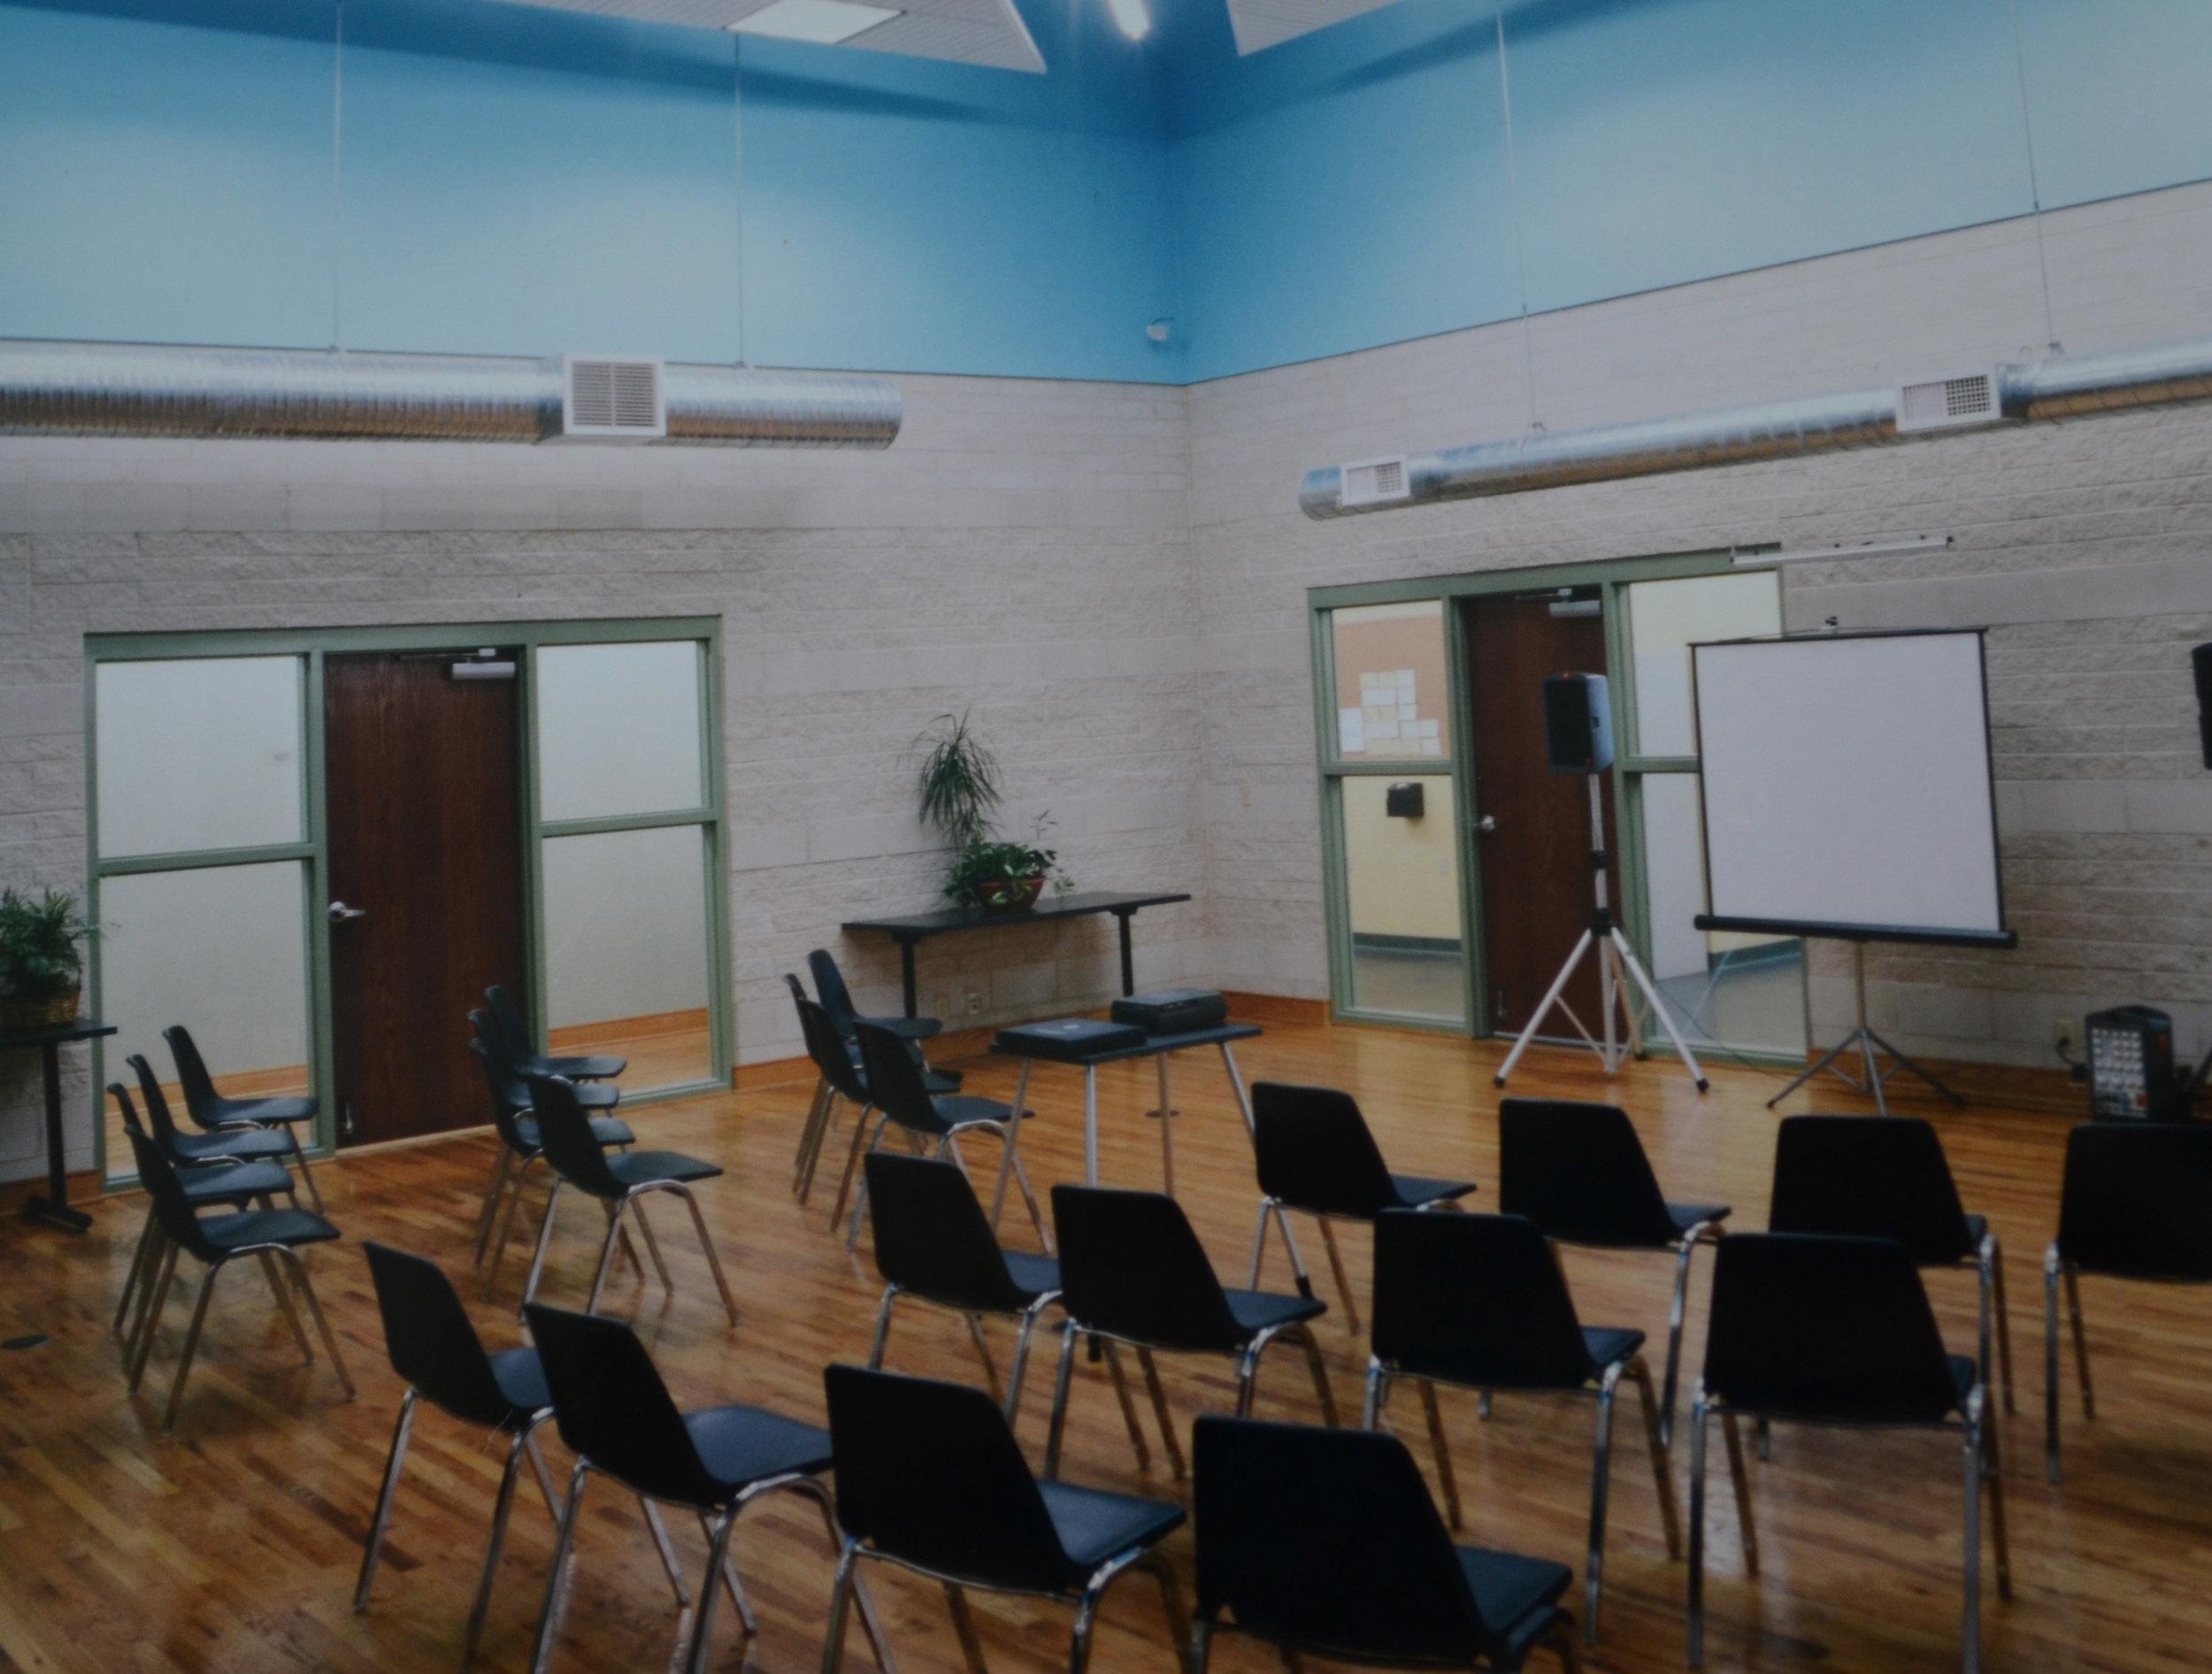 cos classroom2.jpg